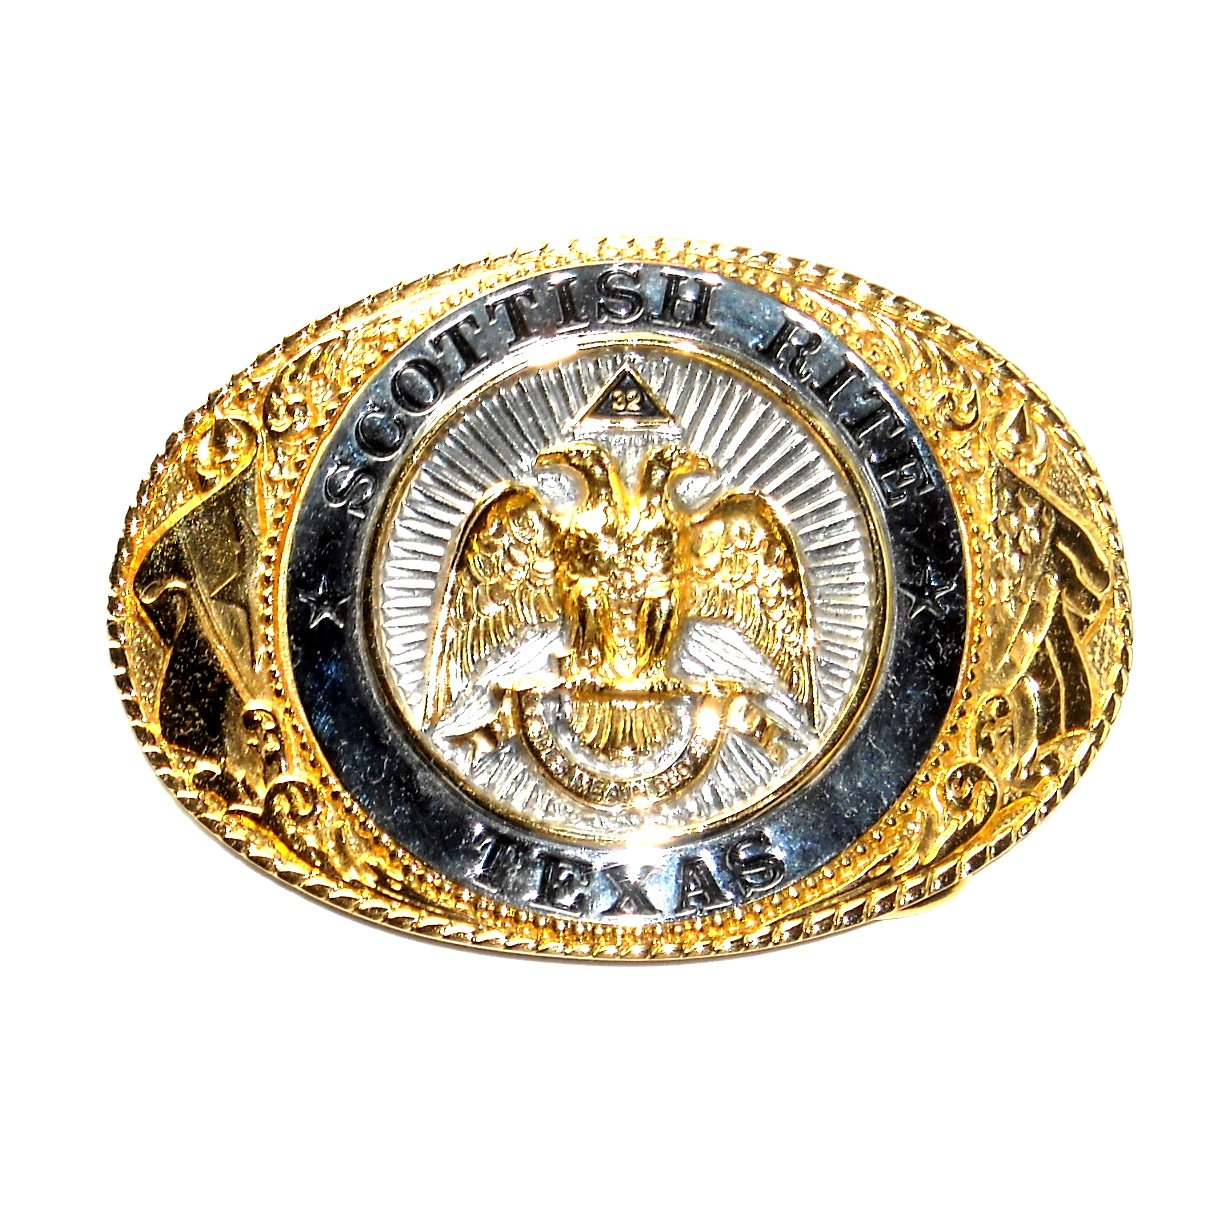 Scottish Rite Texas 24kt Gold Plate Creative Casting Brass Belt Buckle